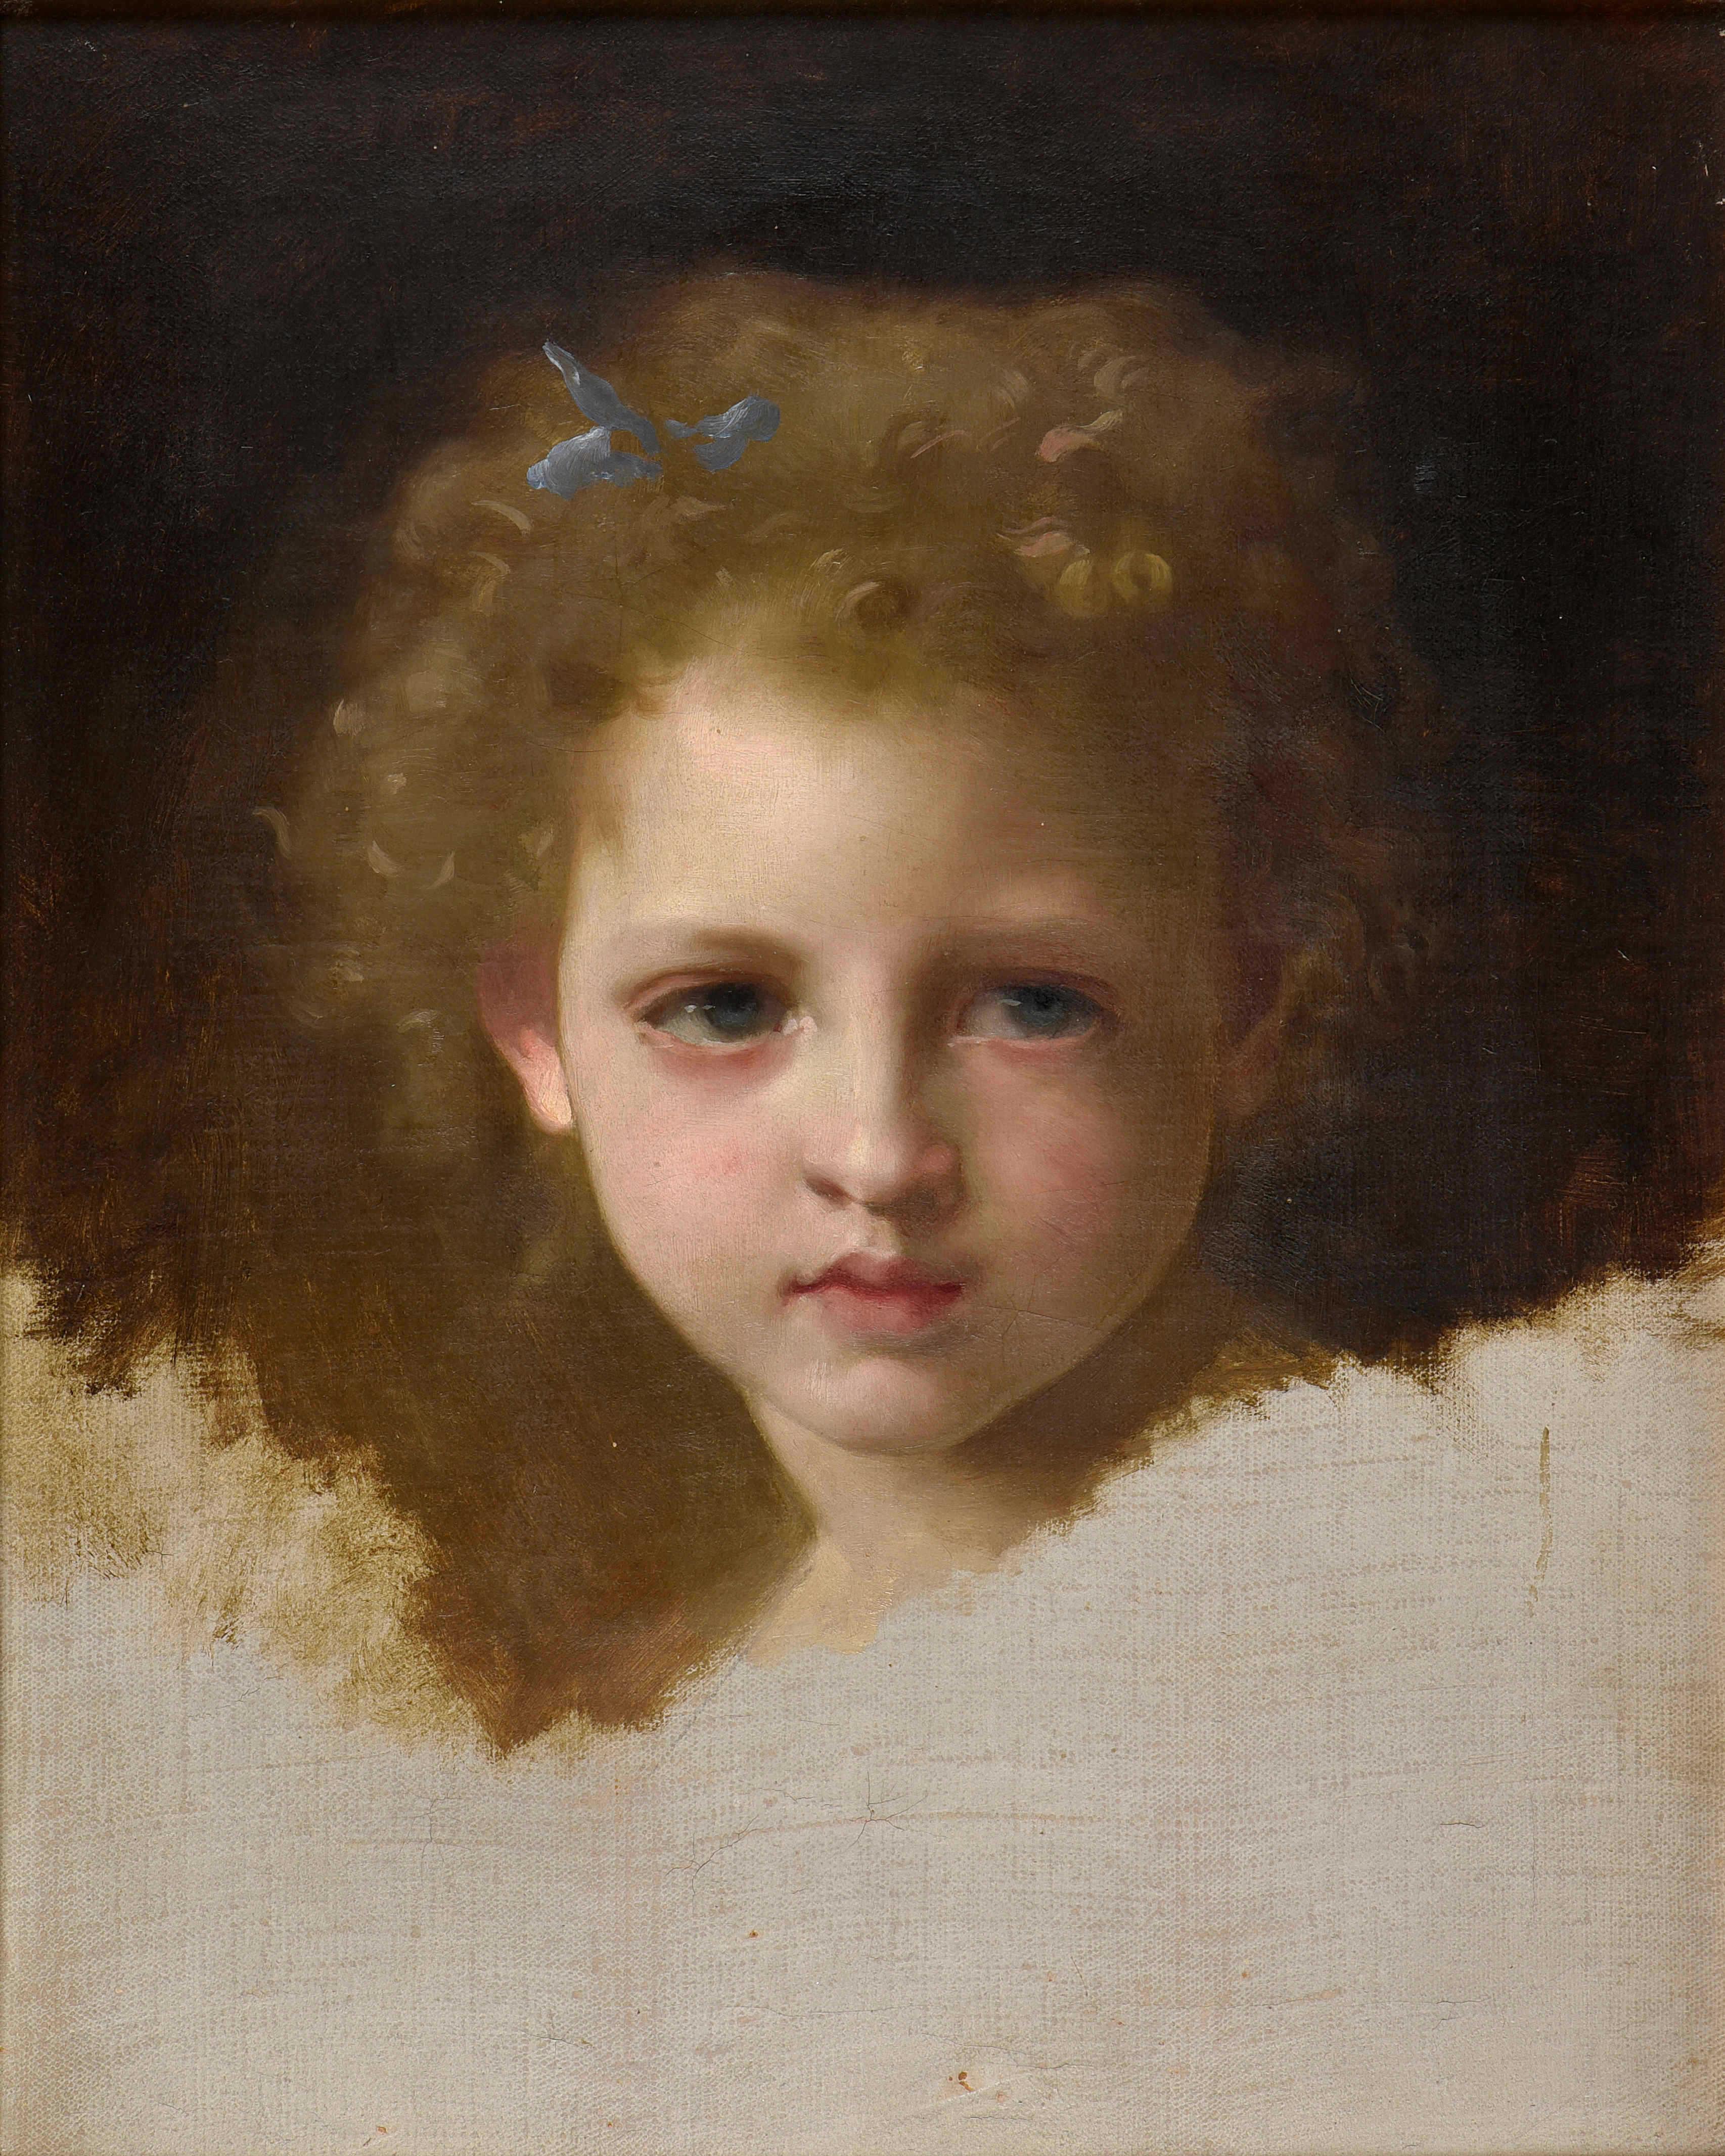 Bouguereau, fillette au ruban bleu vente conan 13-10-19